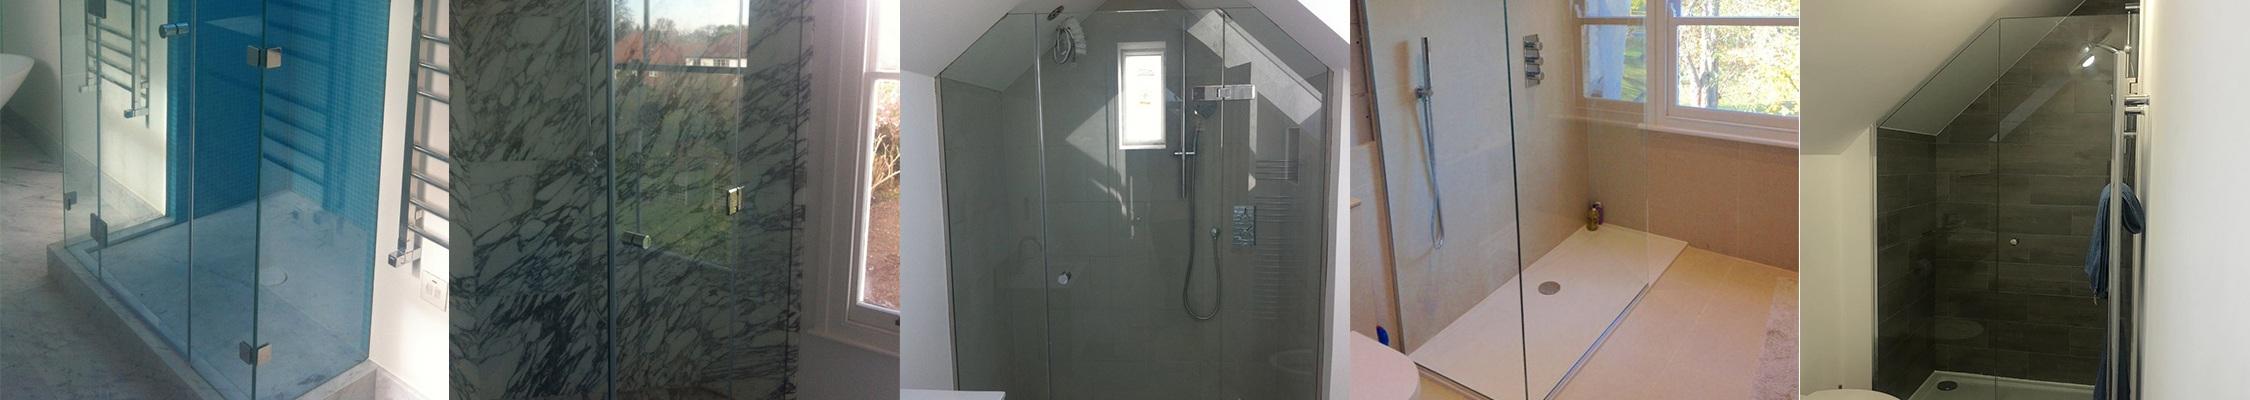 Shower screens and bathroom glazing installation